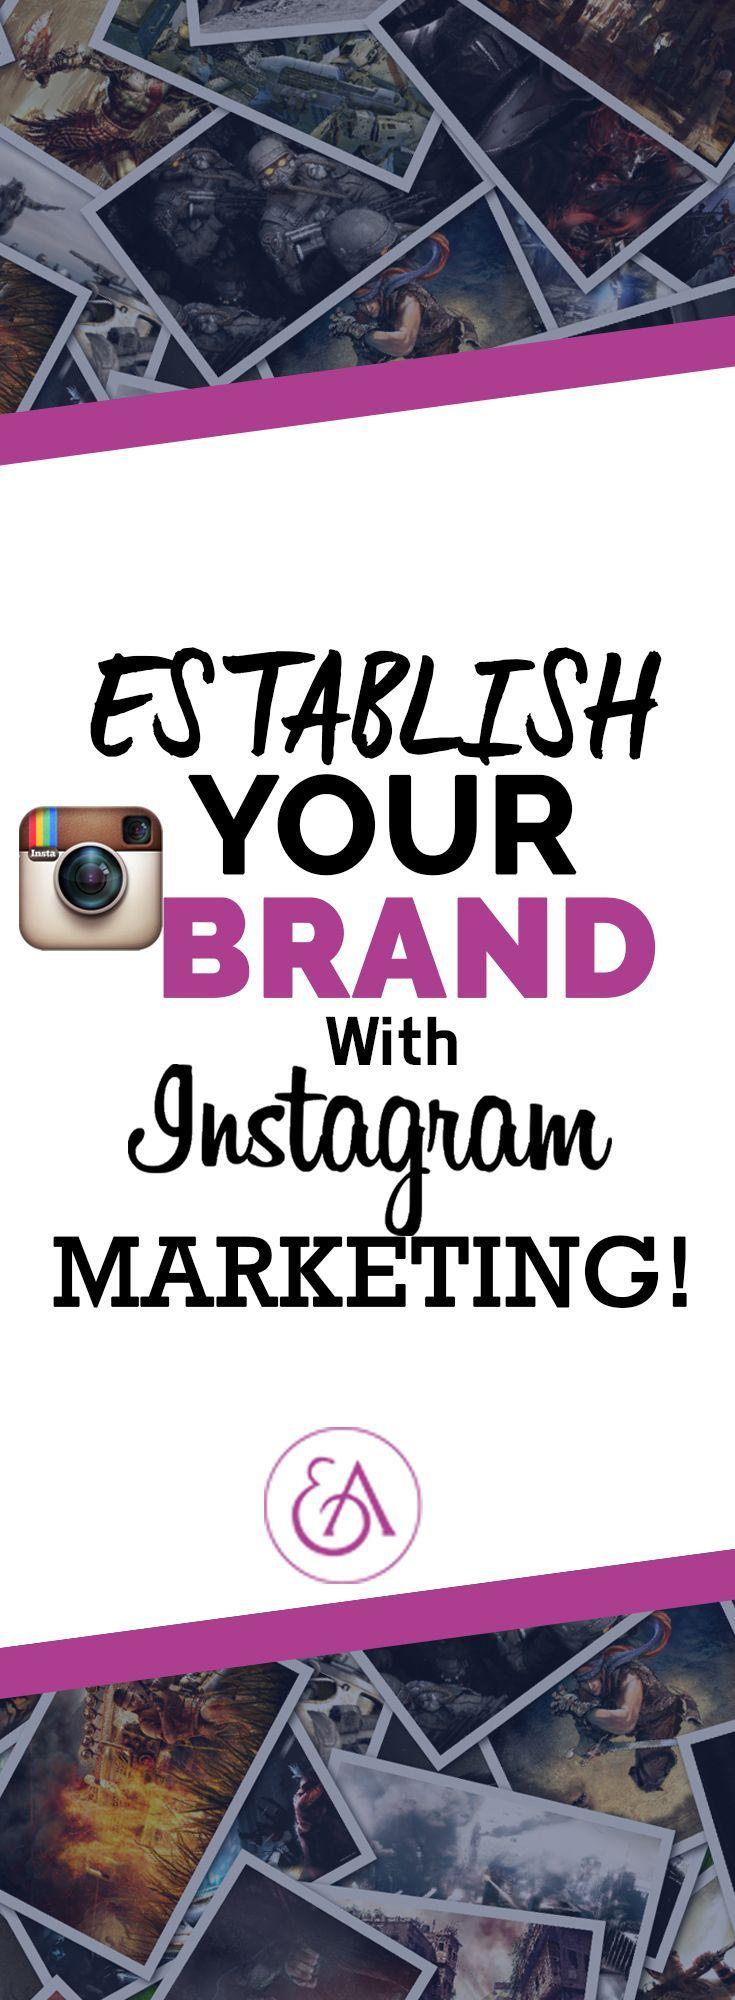 Establish Your Brand With Instagram Marketing Instagram